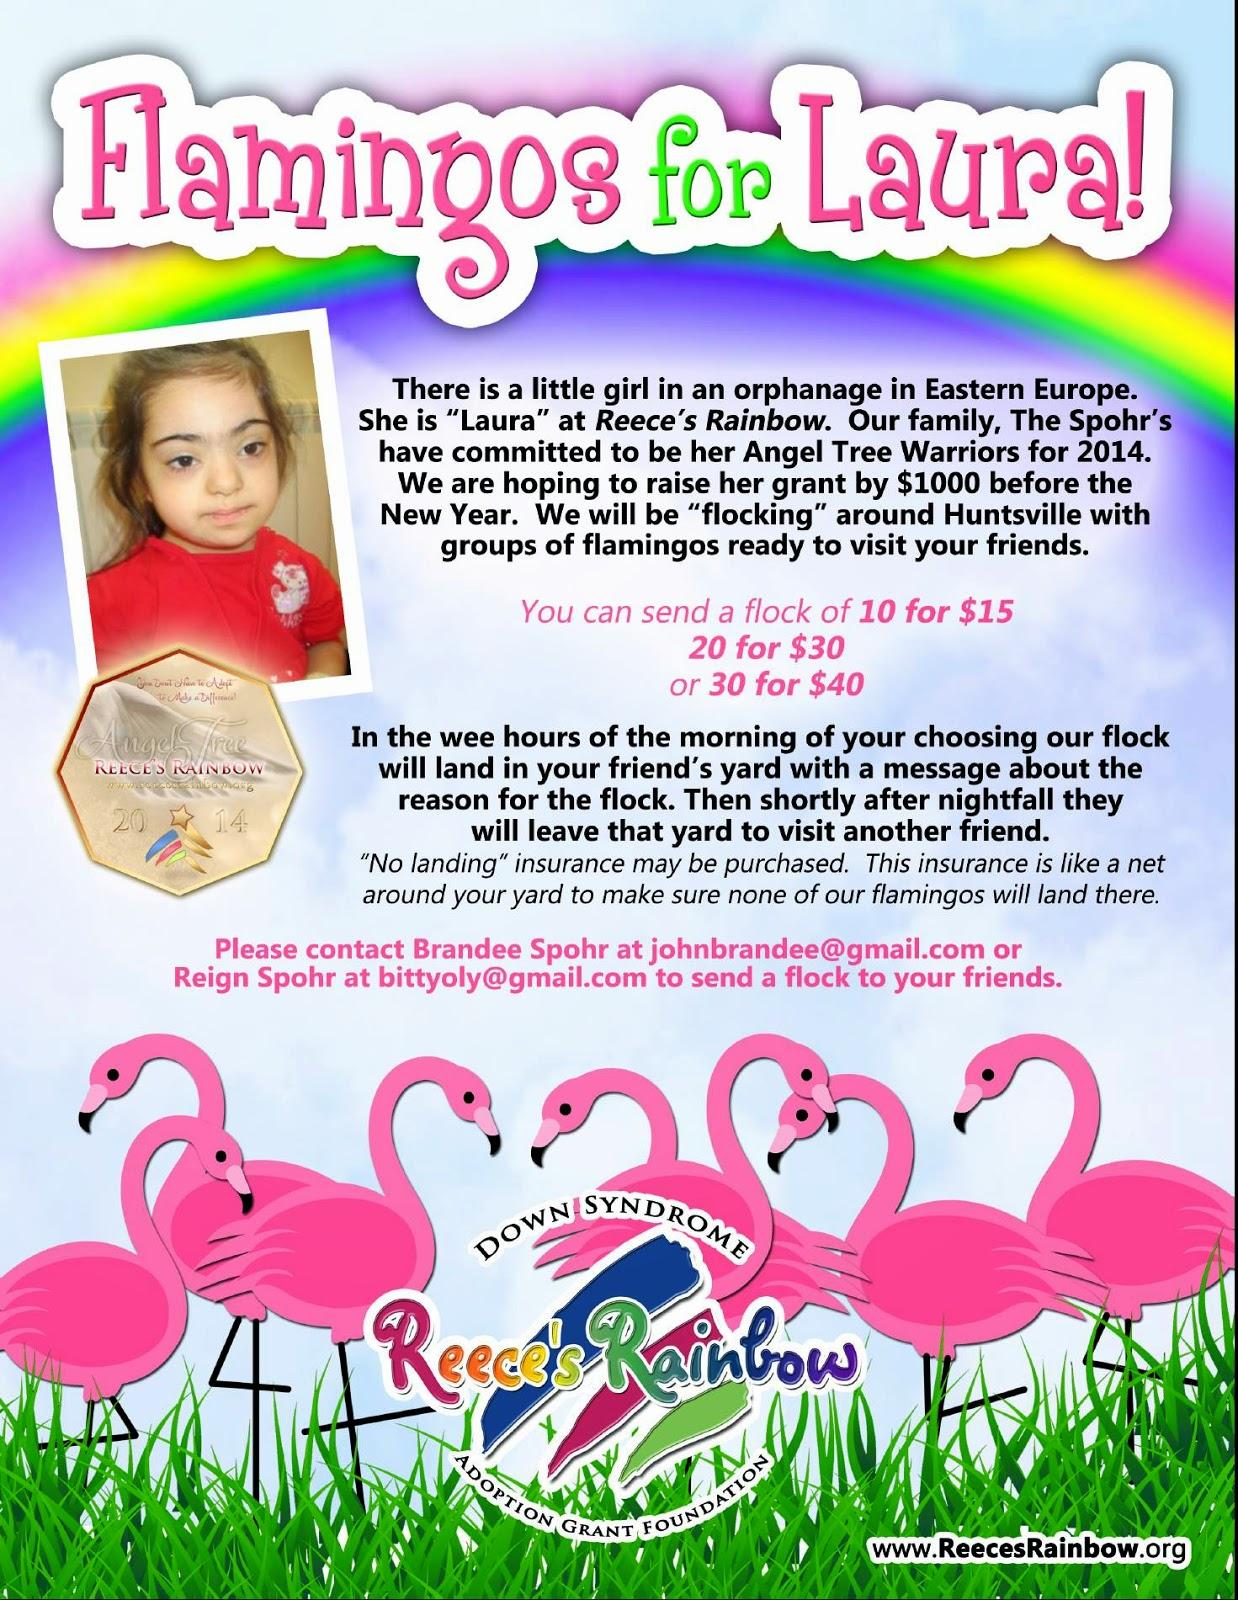 Flamingos for Laura